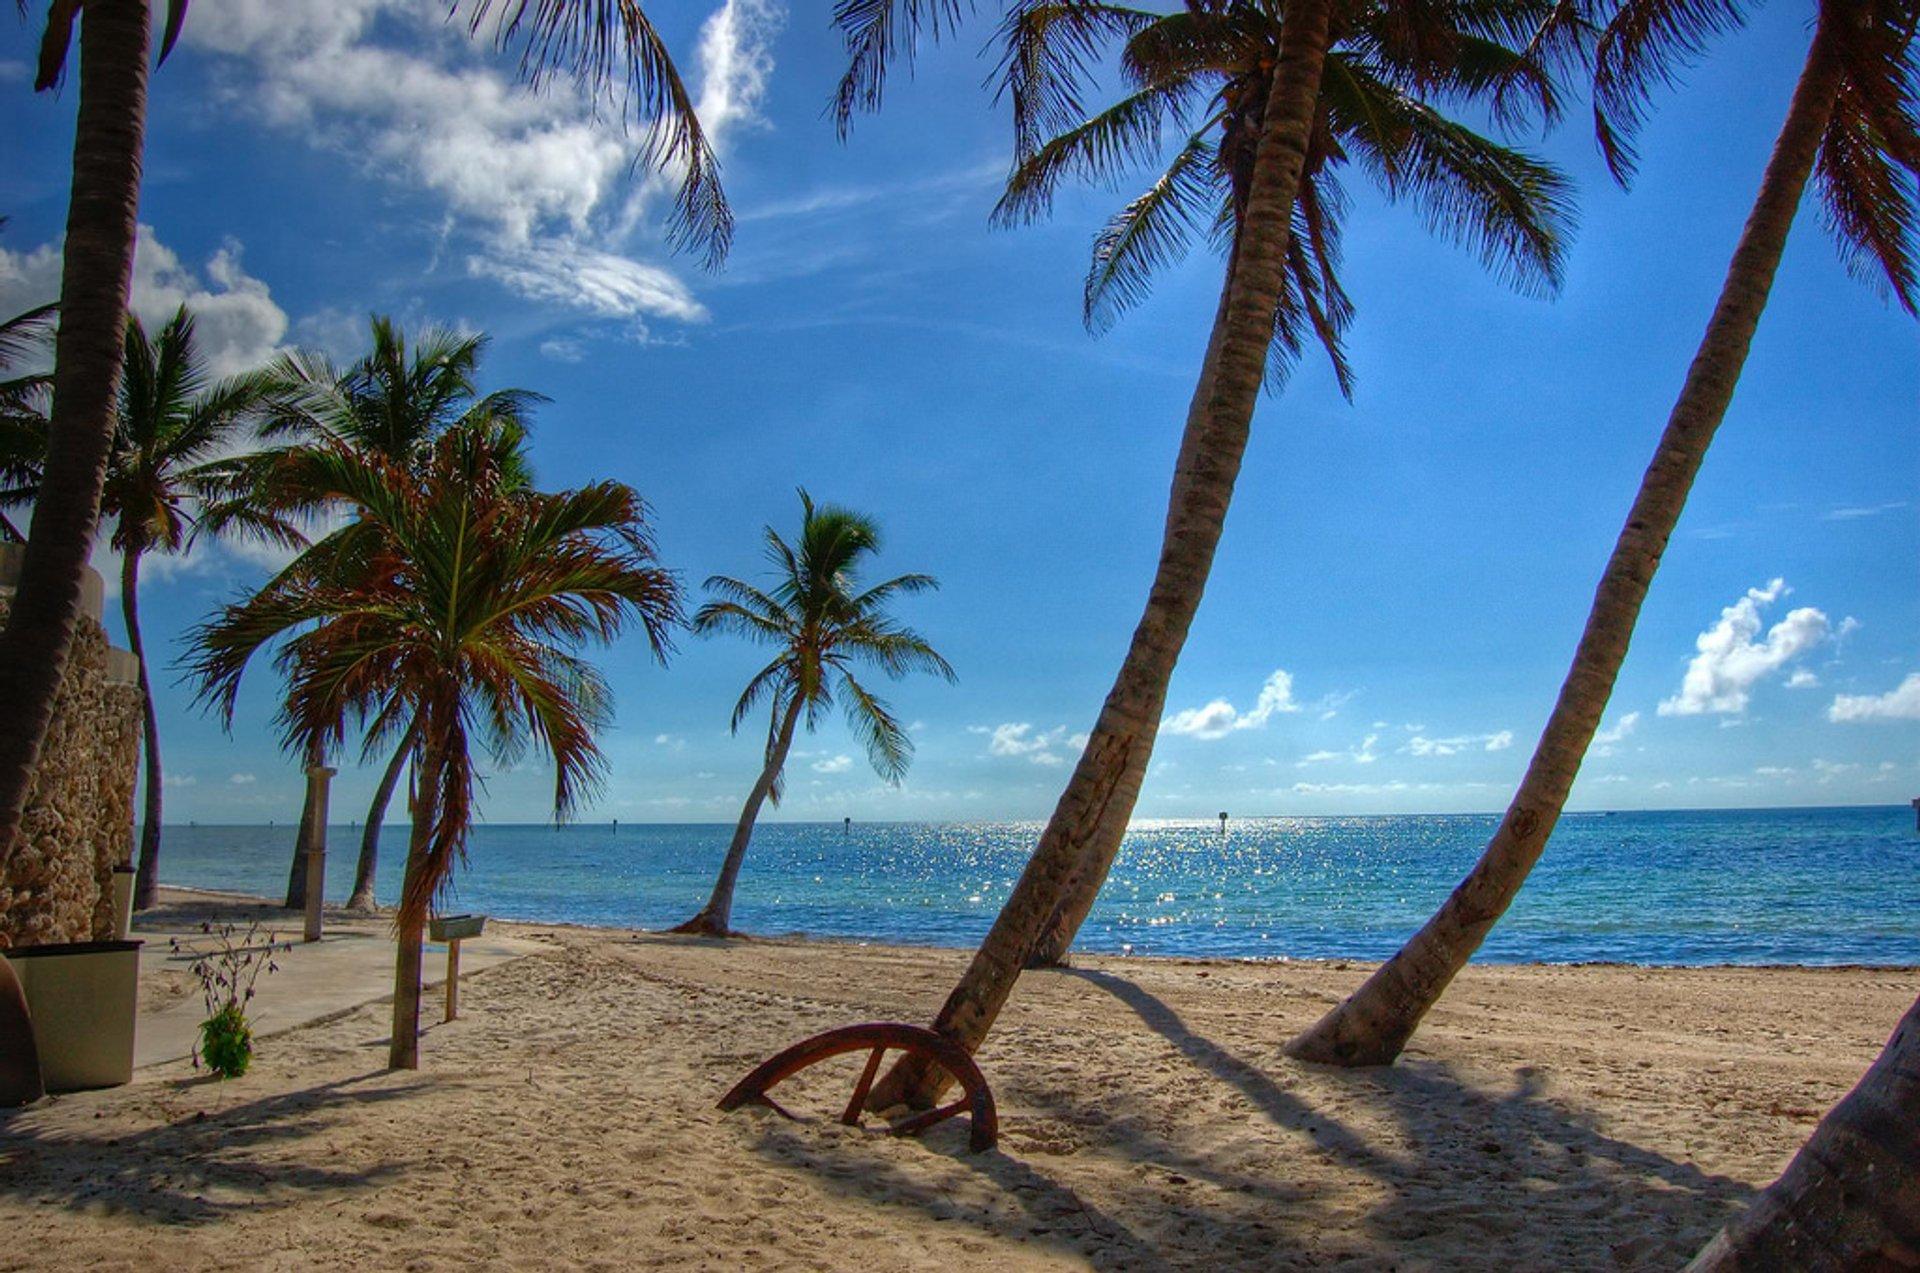 Beach Season in Florida 2020 - Best Time